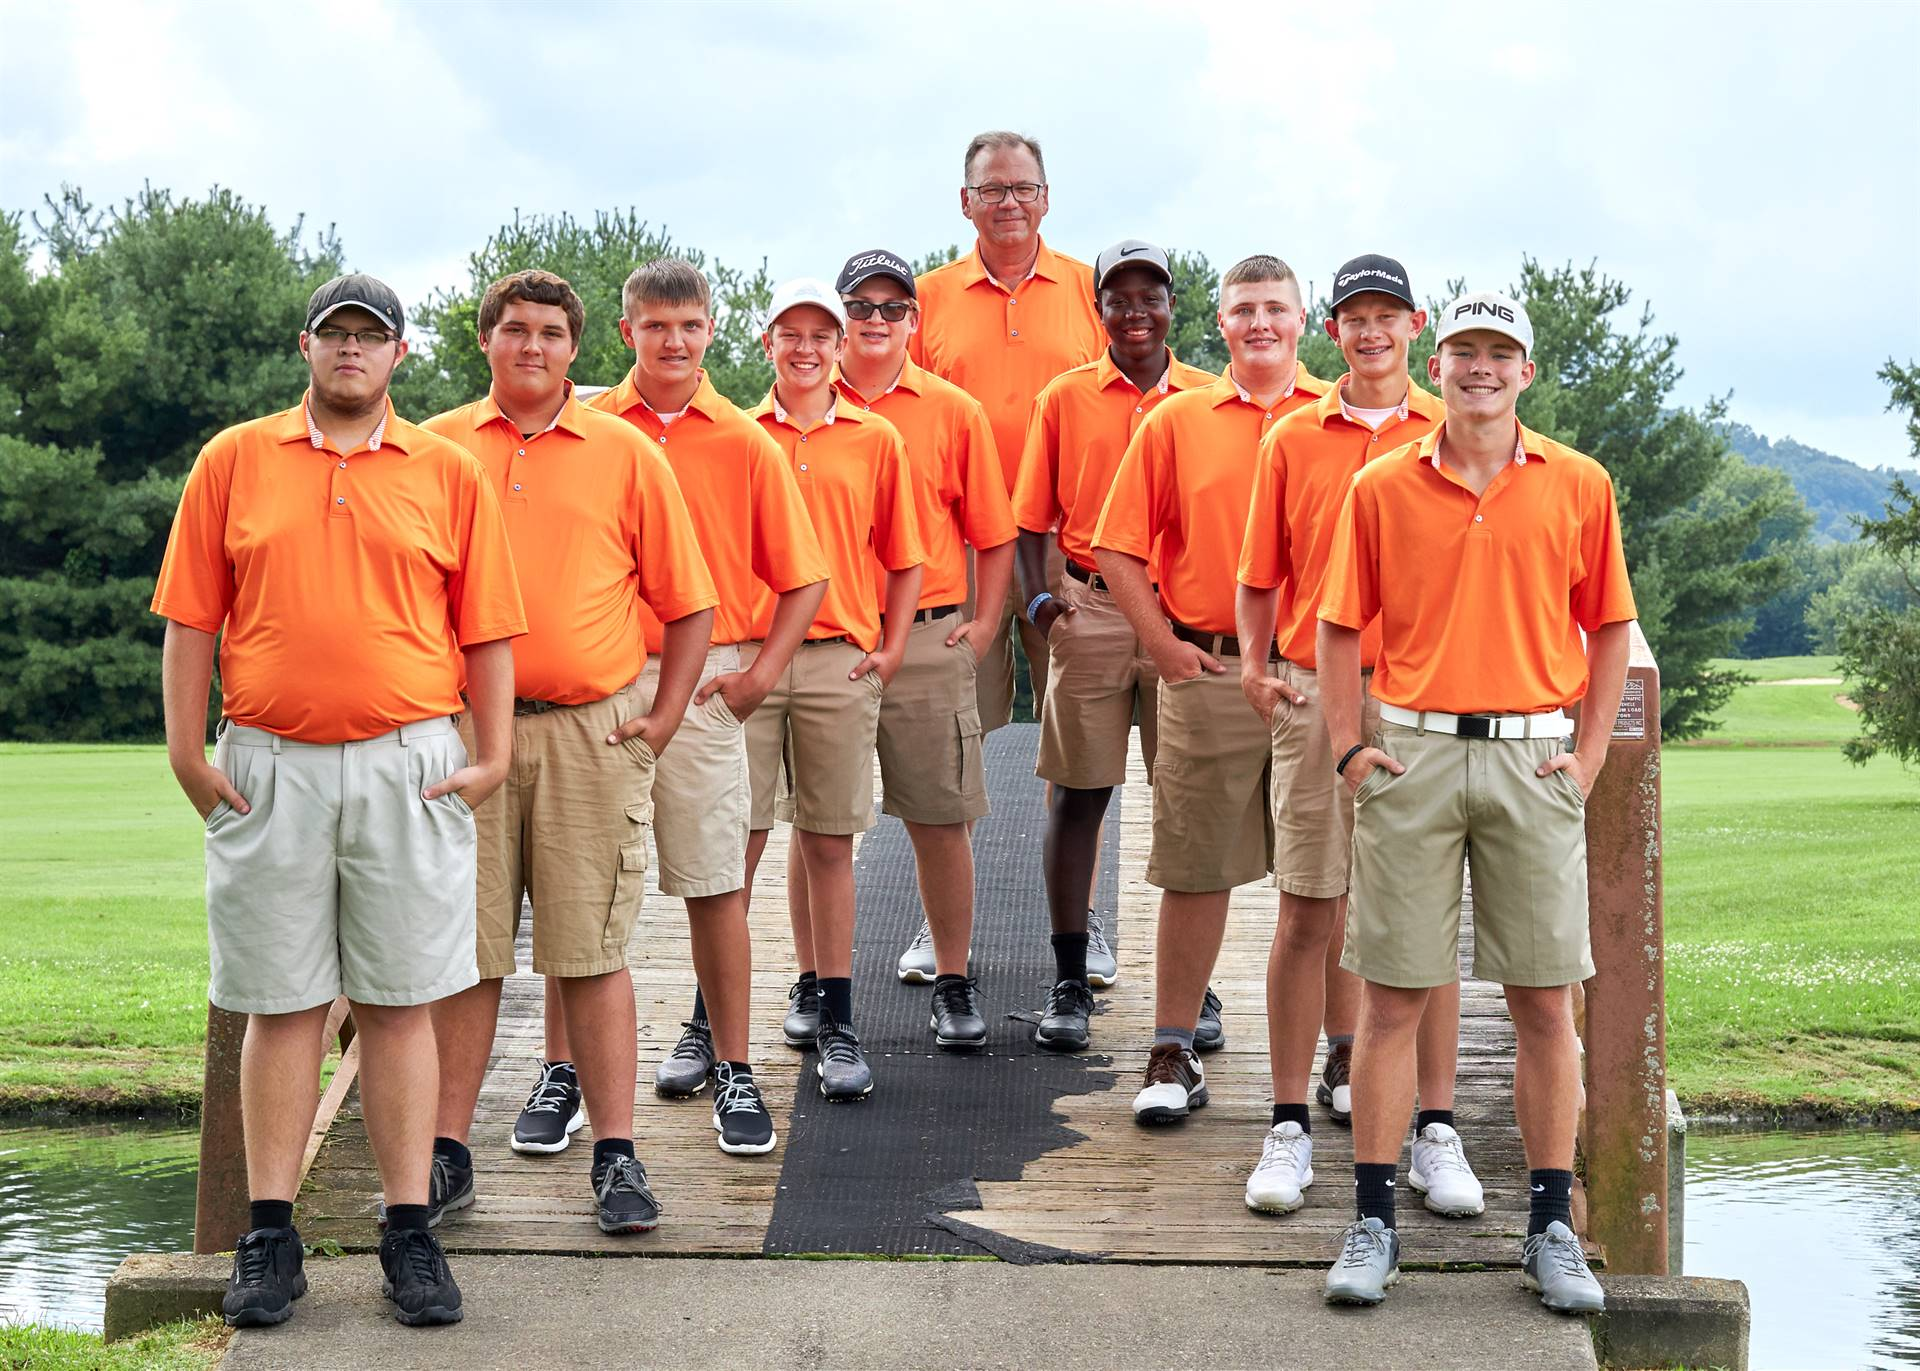 hs boys golf team